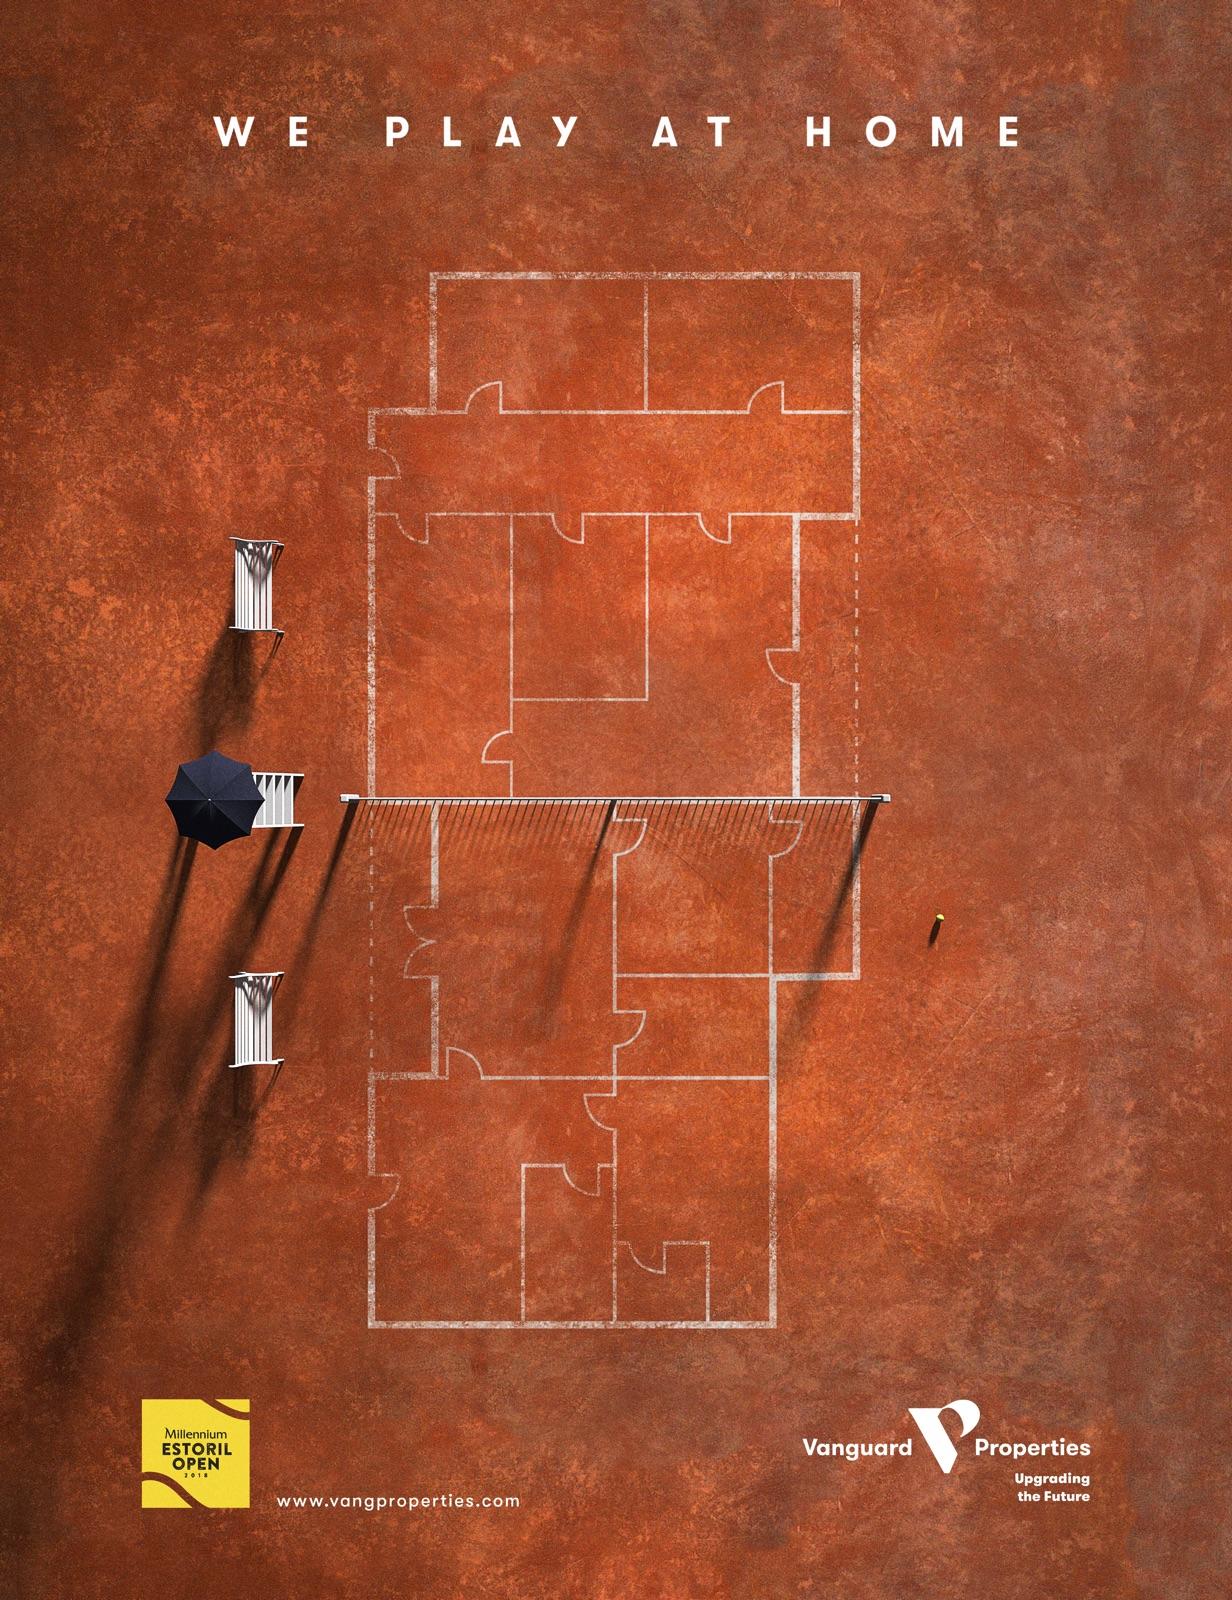 Vanguard Properties Print Advert By By Interactive Brands Agency: We ...